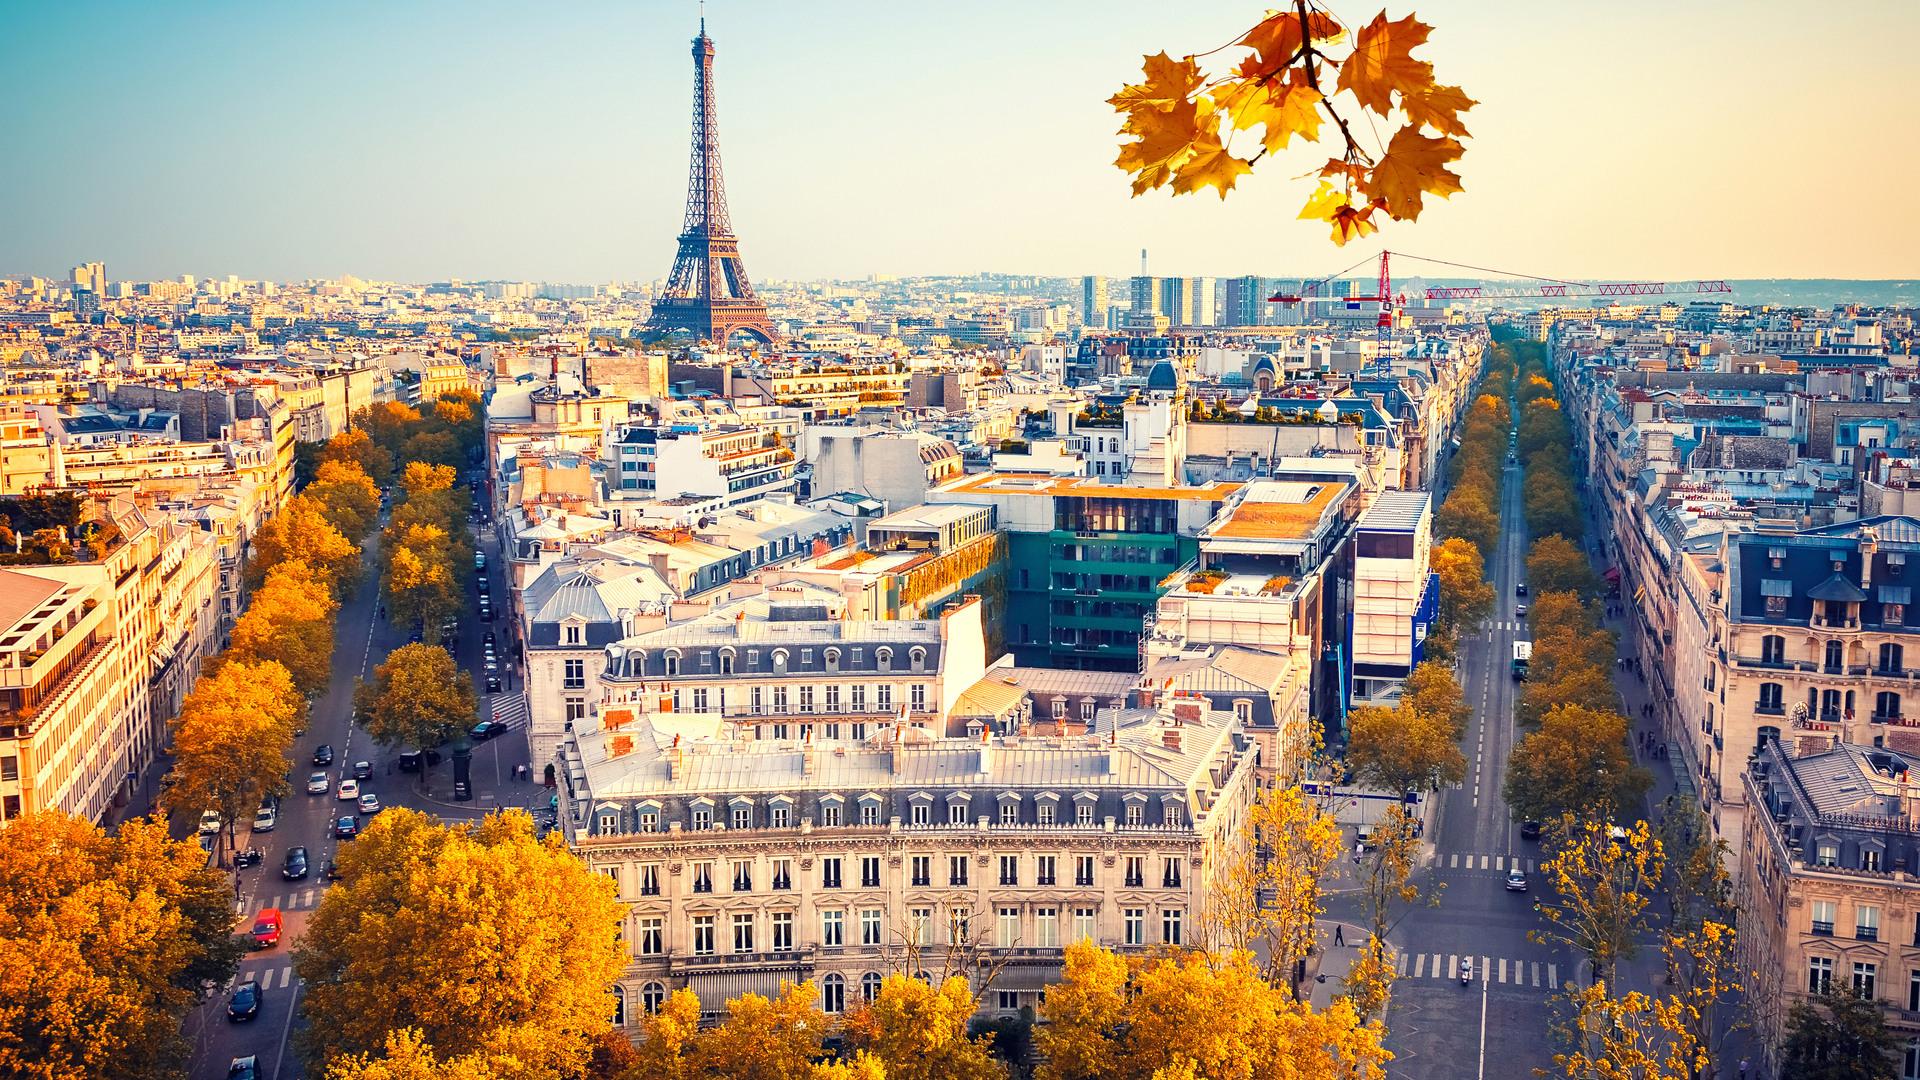 1920x1080 Eiffel Tower Paris City Autumn 4k 5k Laptop Full Hd 1080p